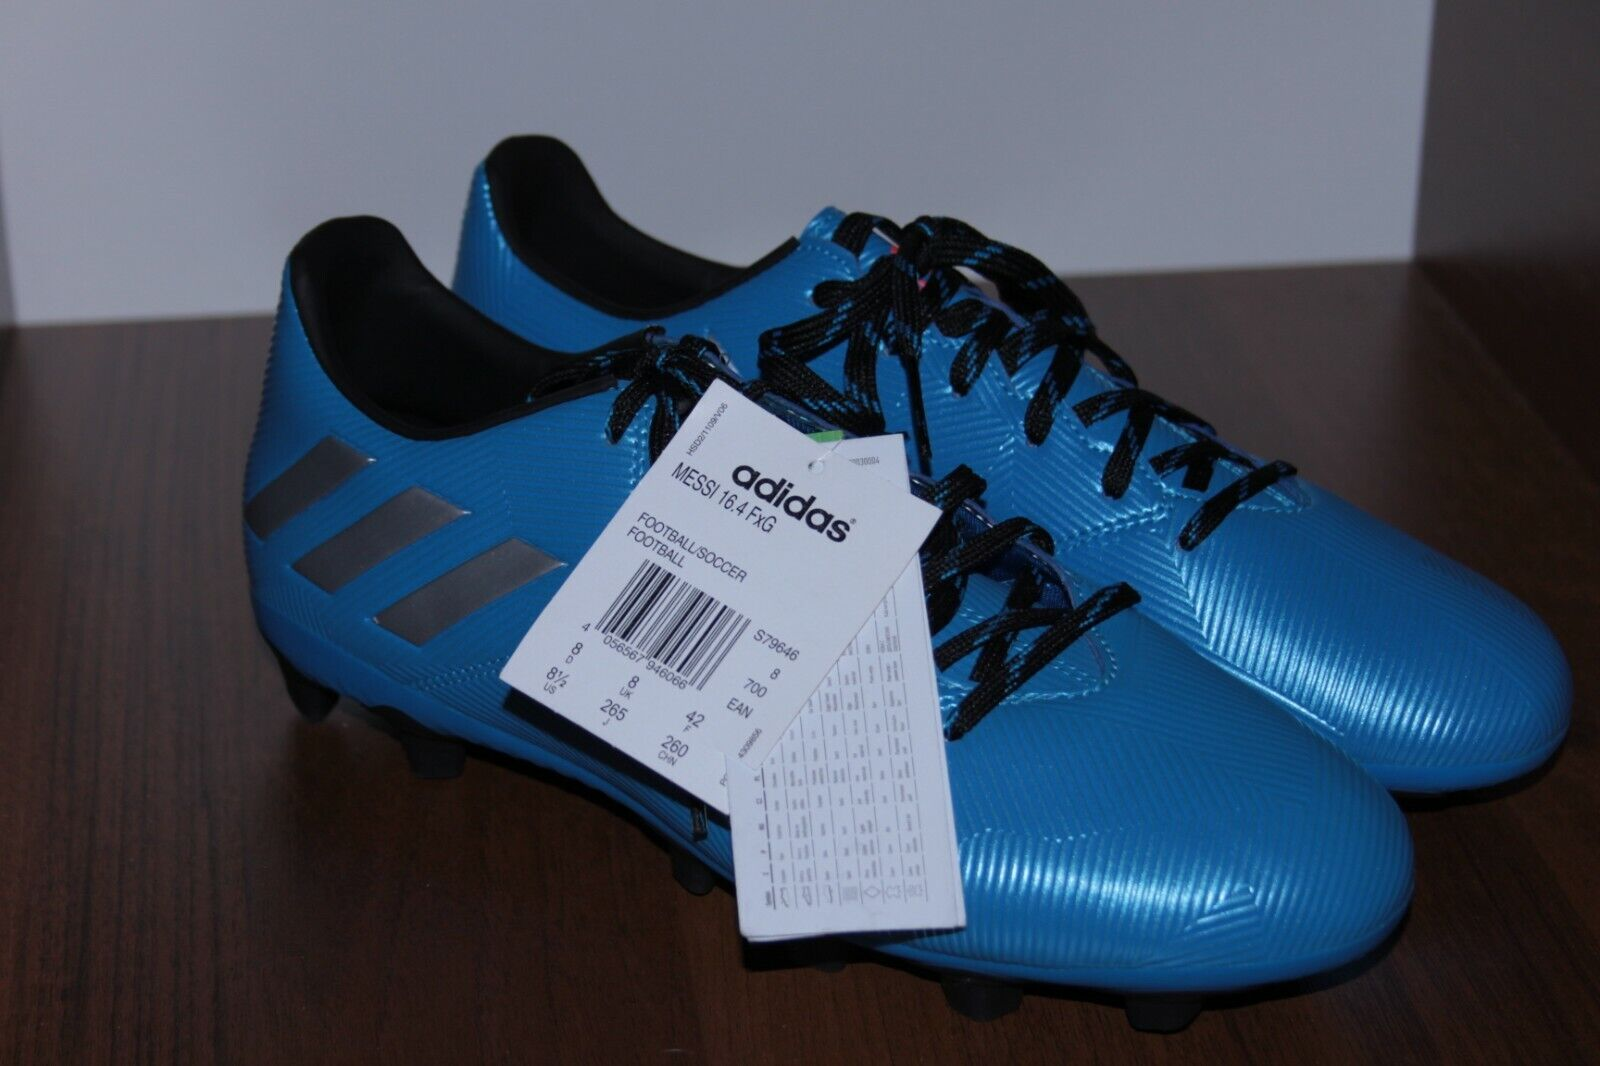 Adidas MESSI 16.4 FG S79646 Football Boots Shoes UK 8 US 8.5 FR 42 - BNWT